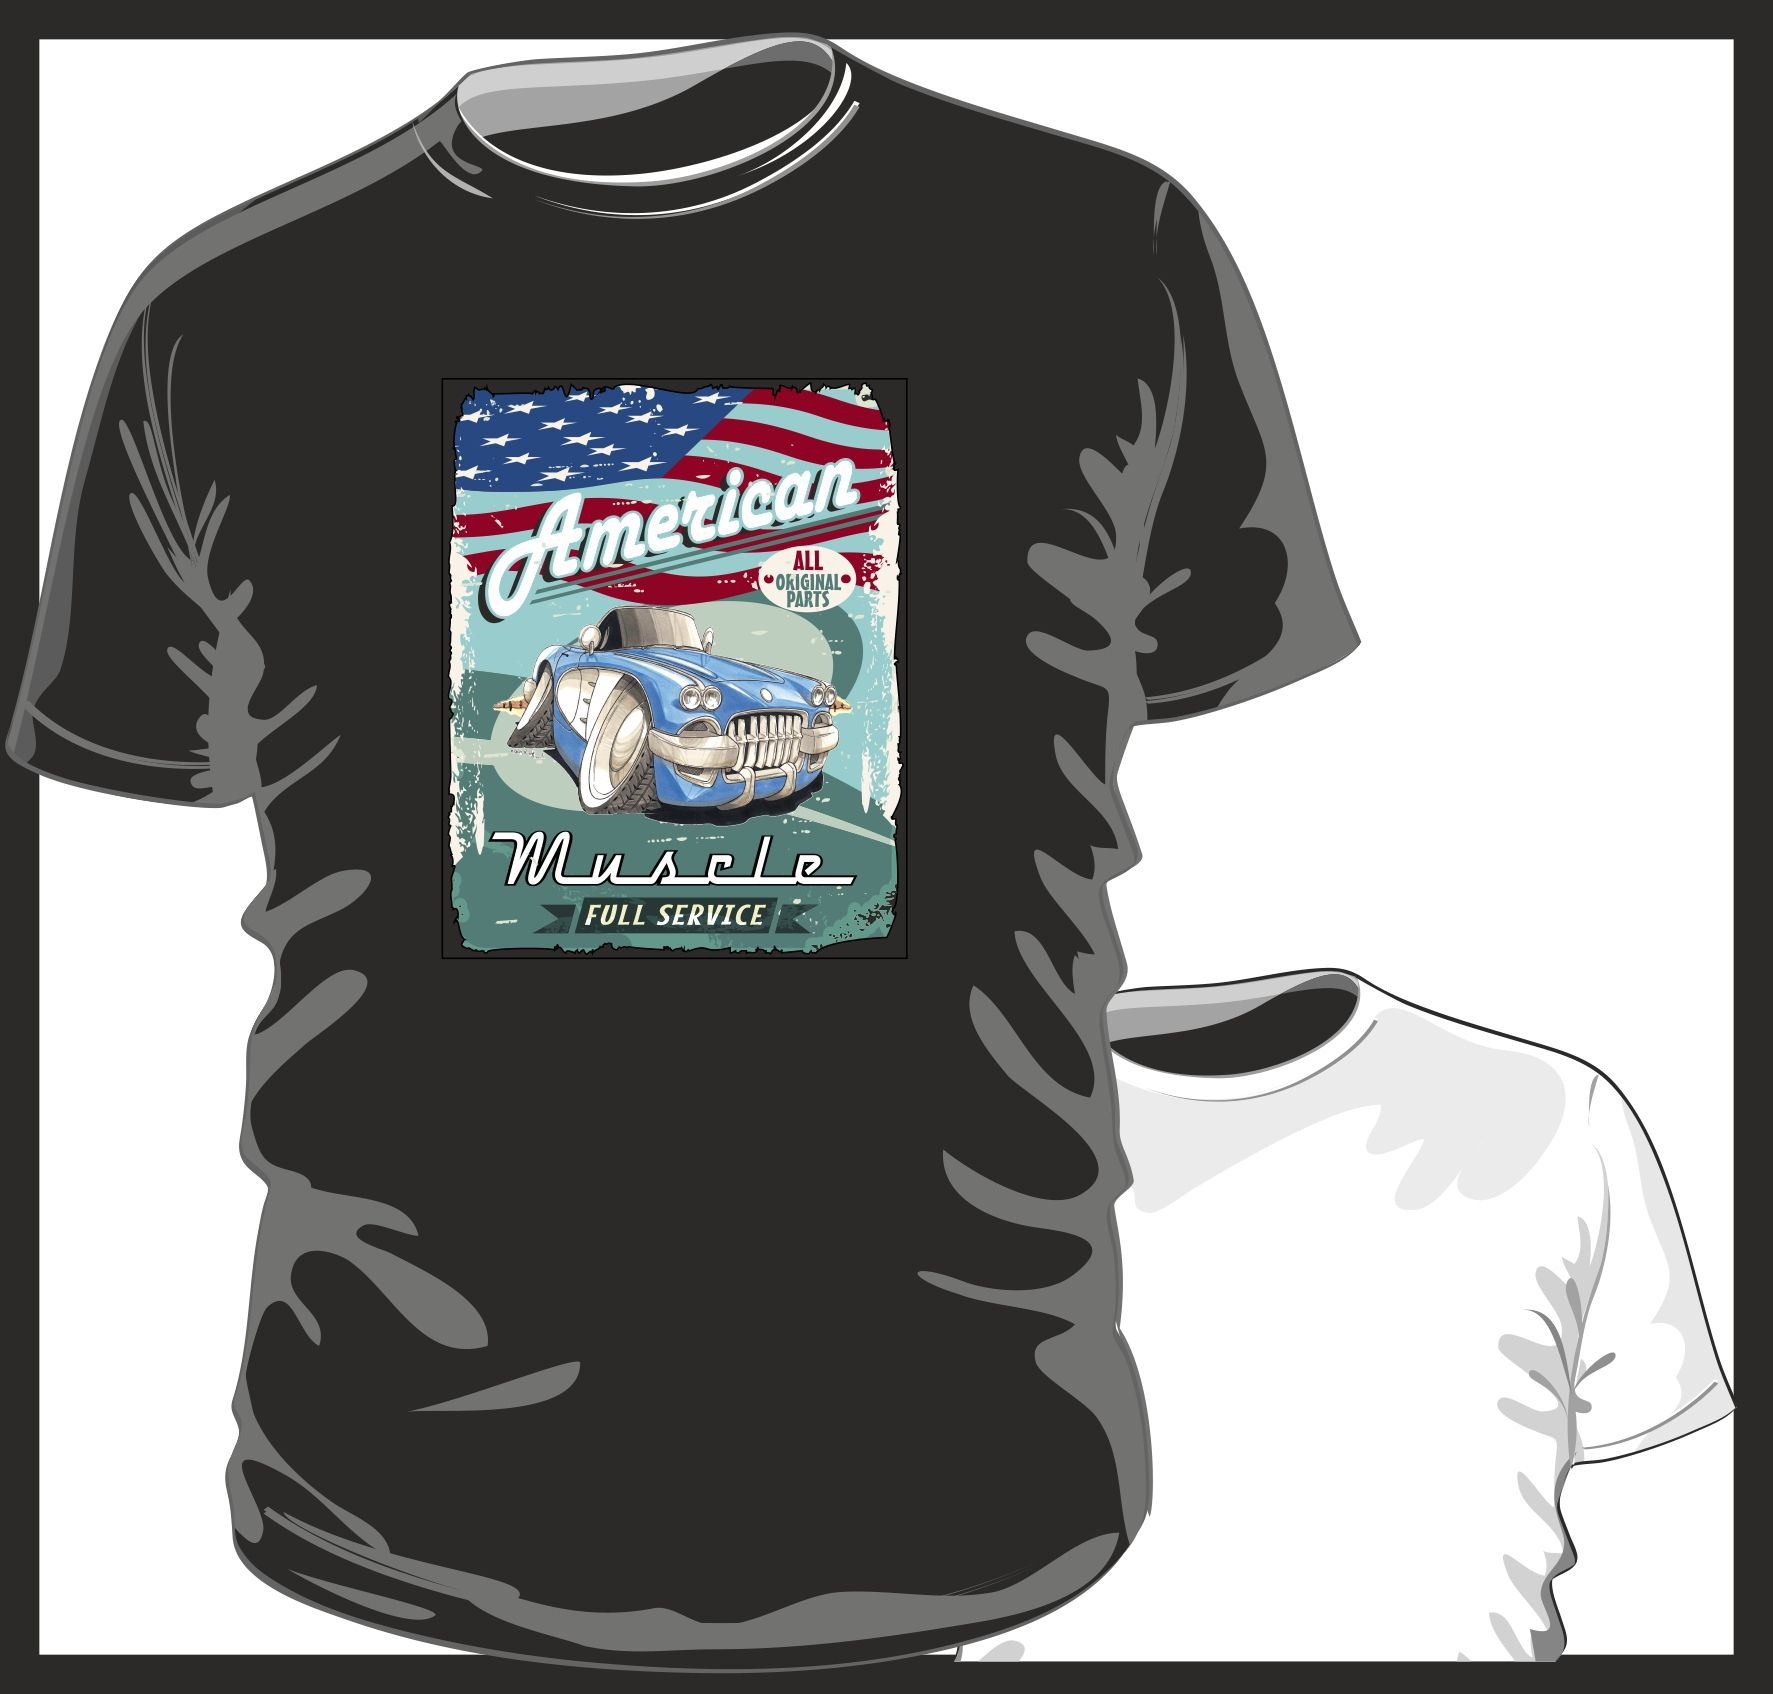 New Chevrolet Corvette Stingray Chevy Men/'s Vintage T-Shirt